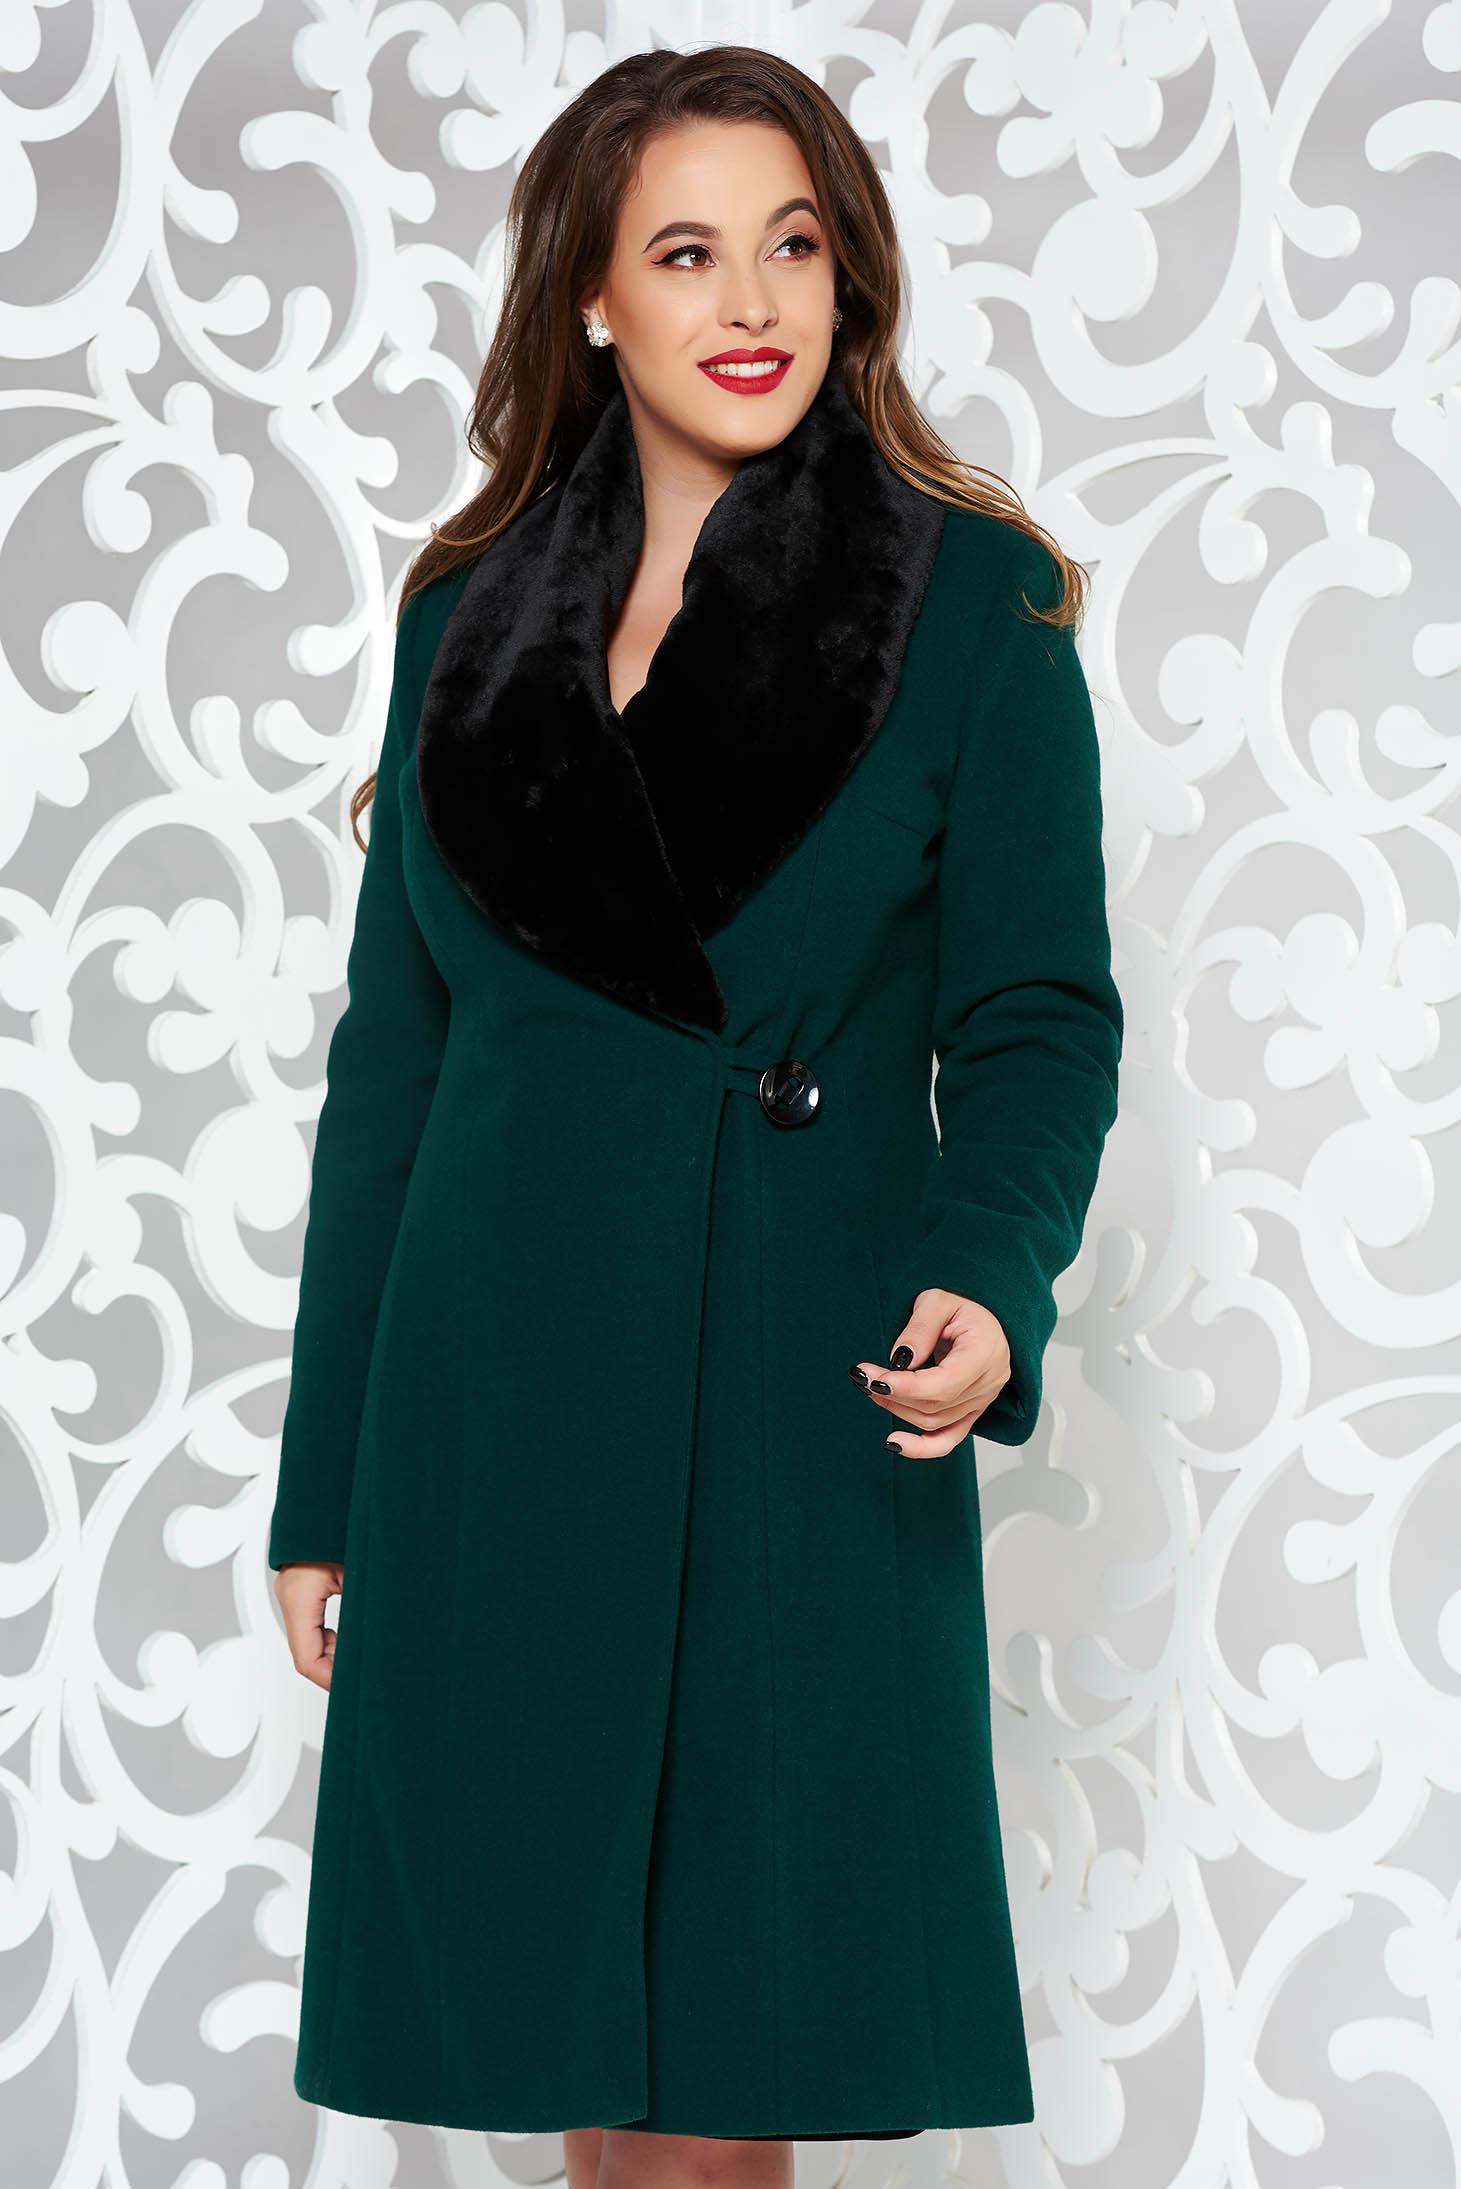 LaDonna darkgreen elegant wool coat arched cut fur collar